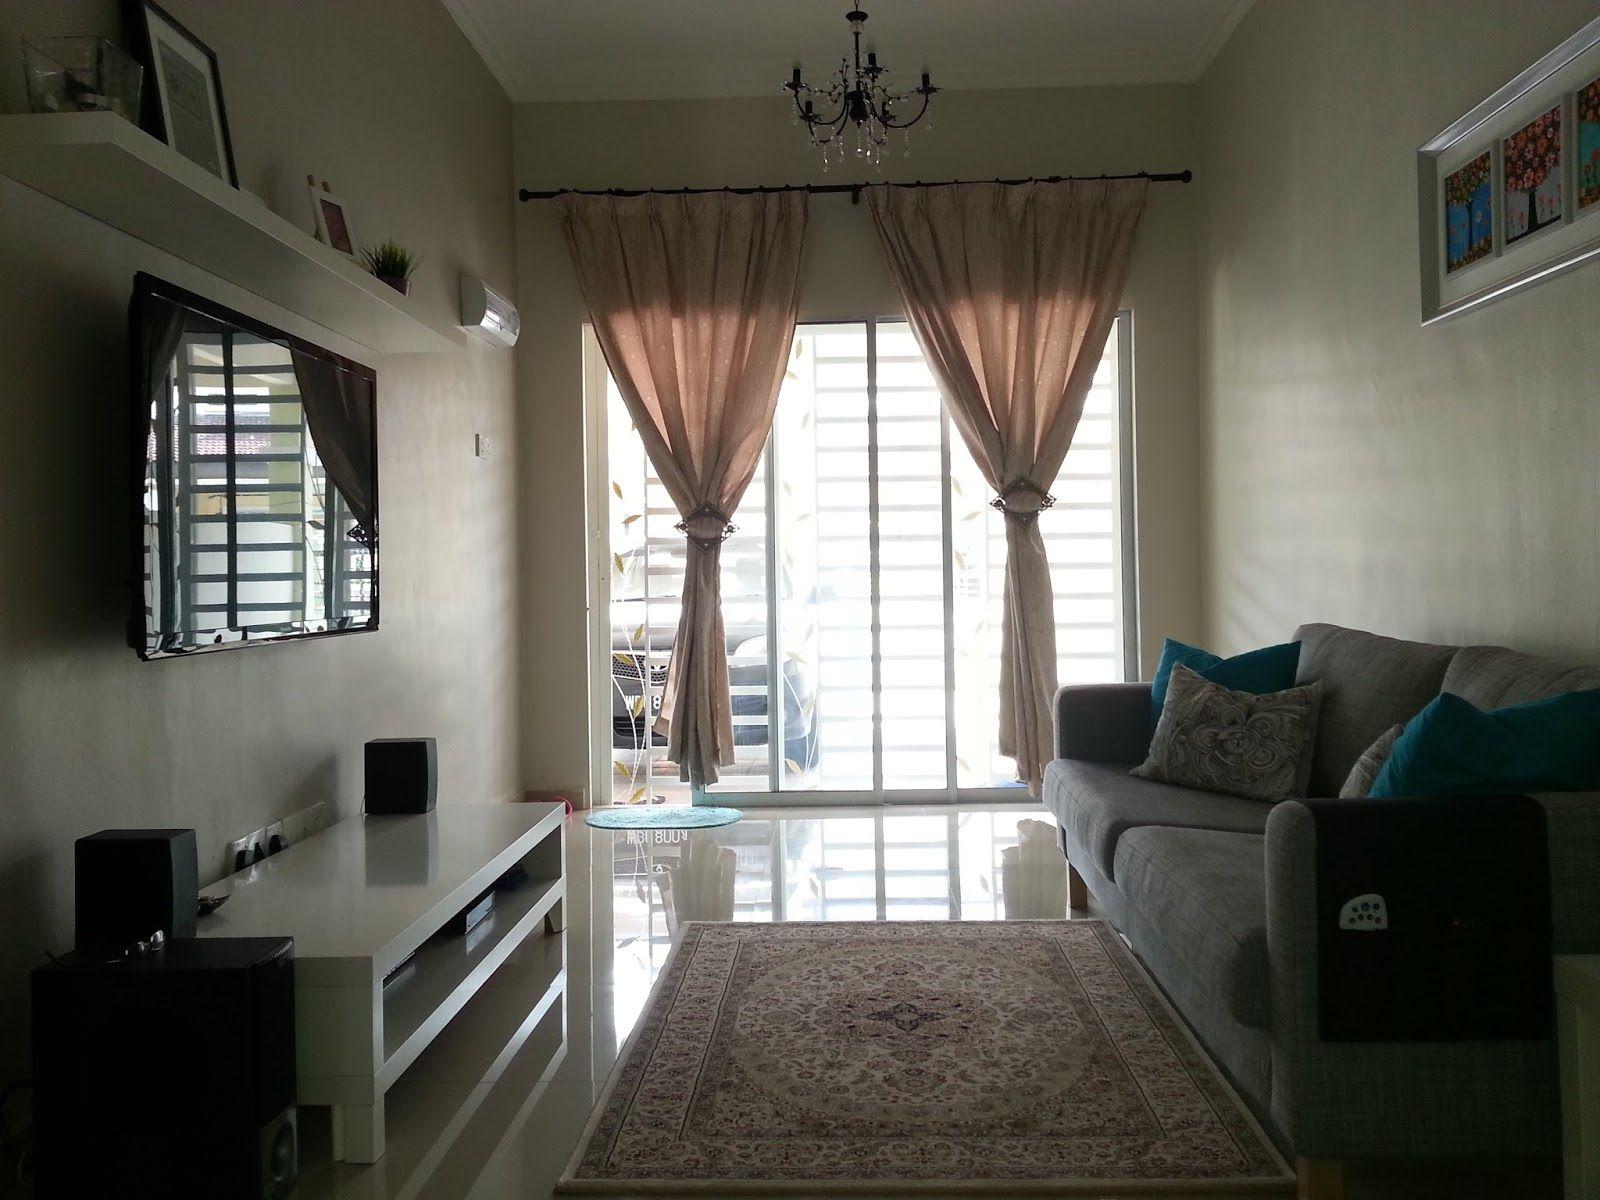 rumah teres moden design ask home design contoh gambar rumah. Black Bedroom Furniture Sets. Home Design Ideas